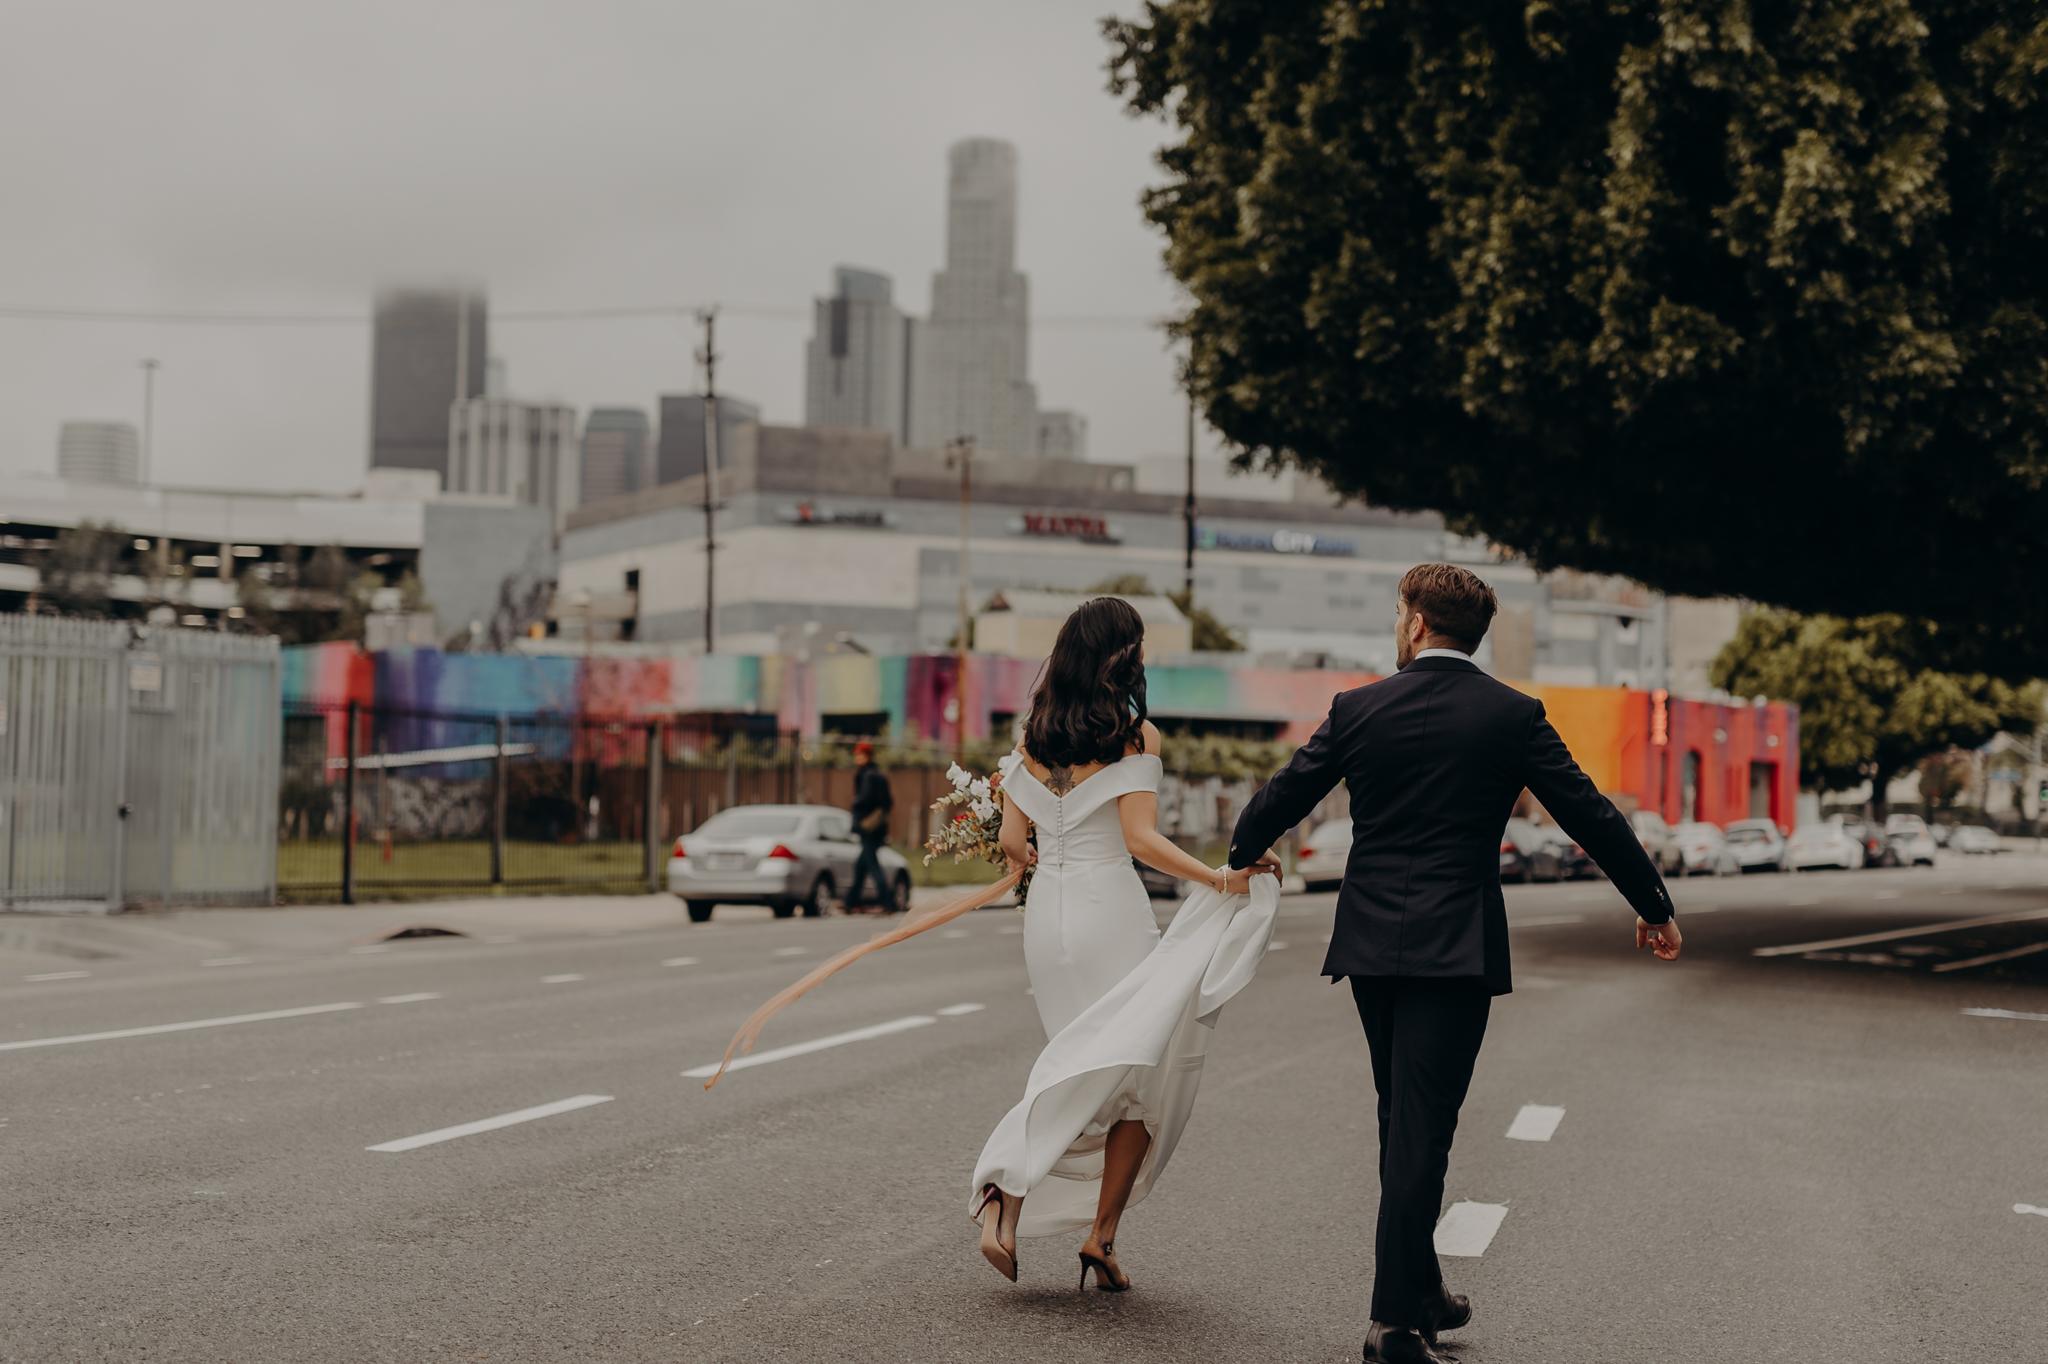 Wedding Photo LA - wedding photographer in los angeles - millwick wedding venue -isaiahandtaylor.com-068.jpg